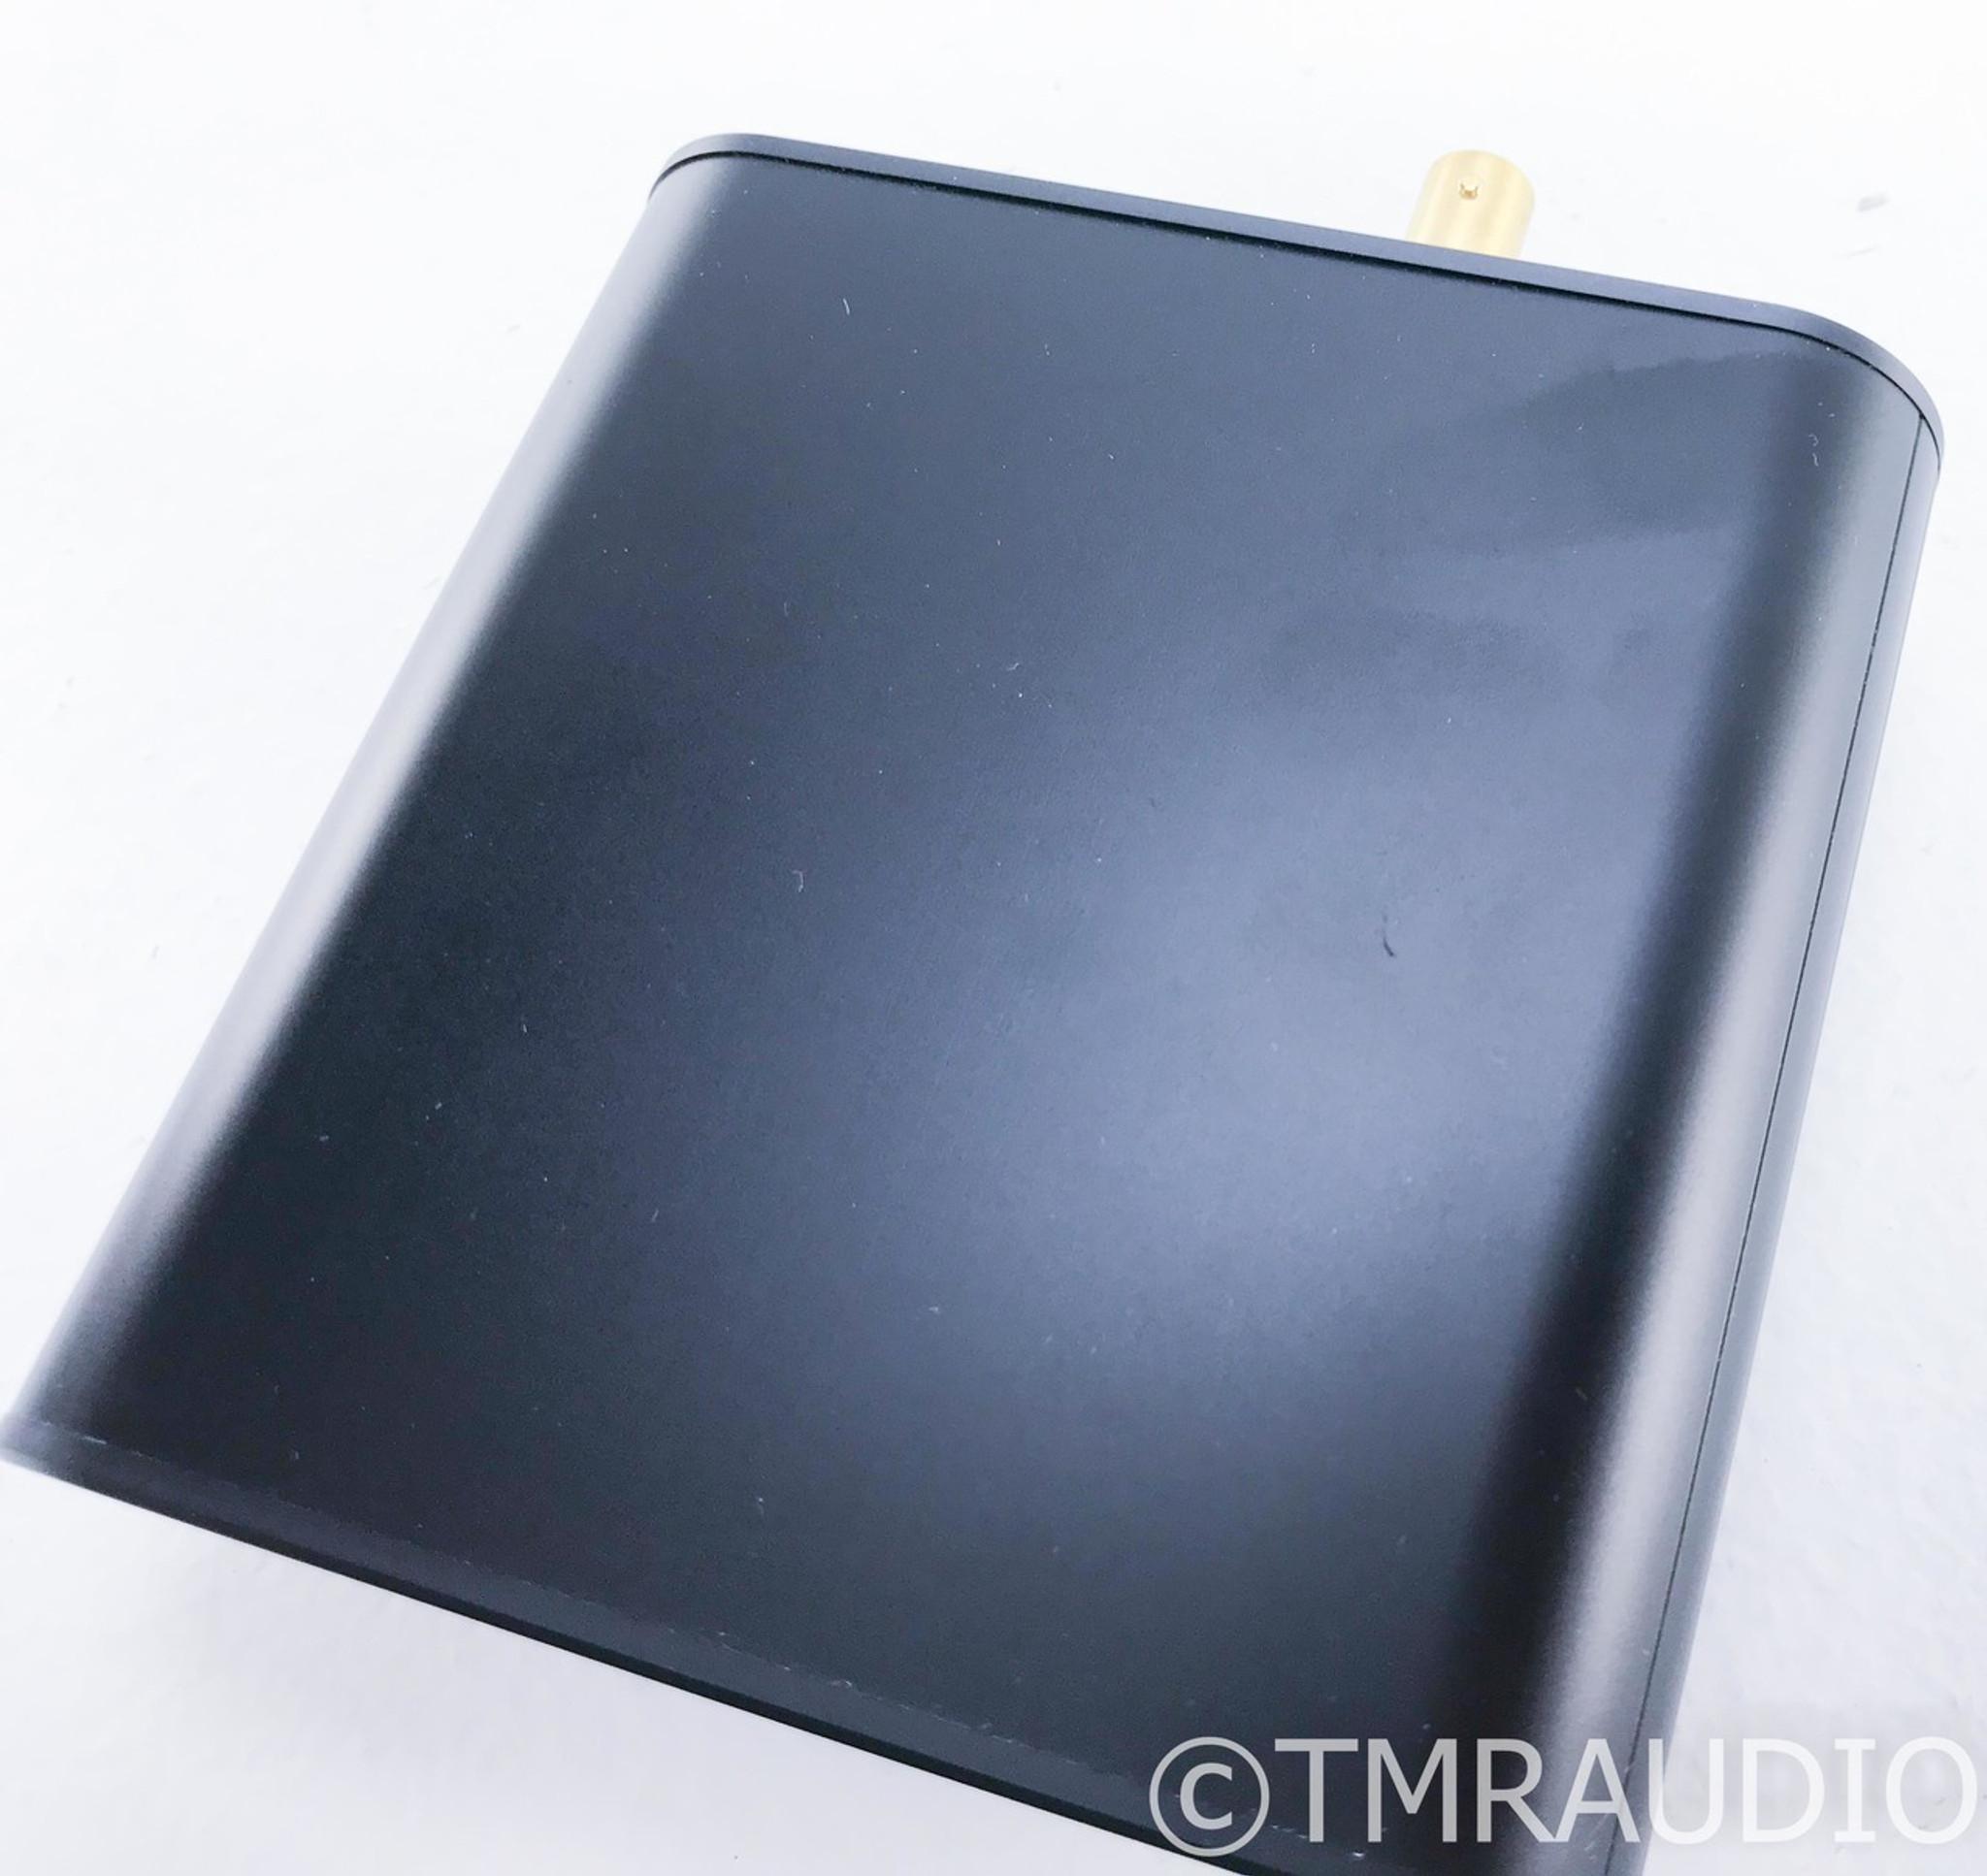 Sonore UltraDigital USB to S/PDIF Converter